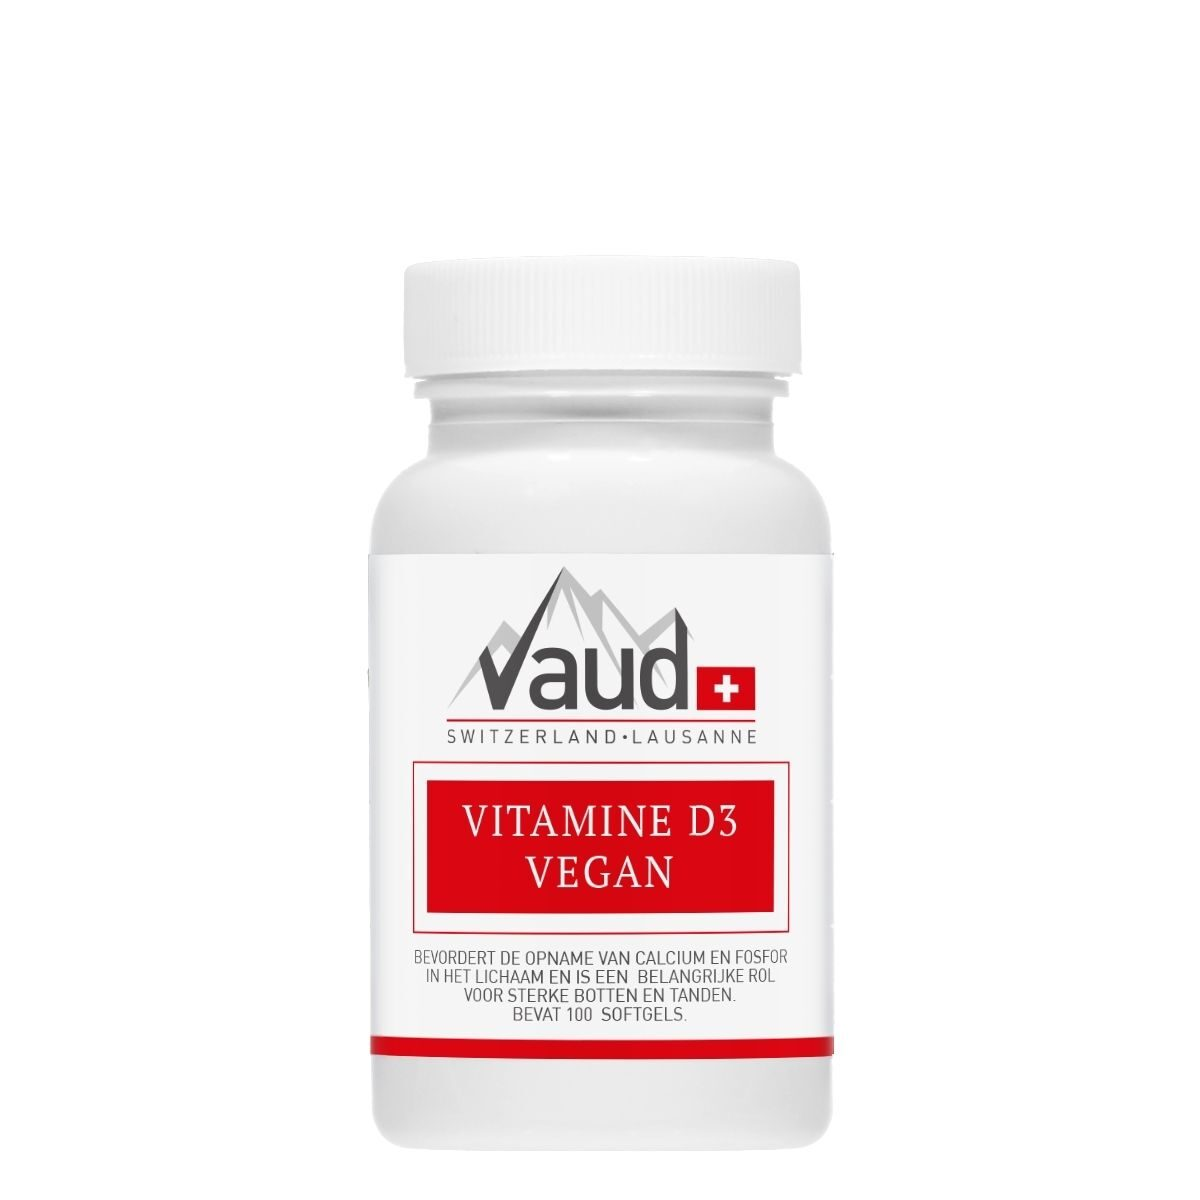 Vitamine D3 Vegan- Vaud